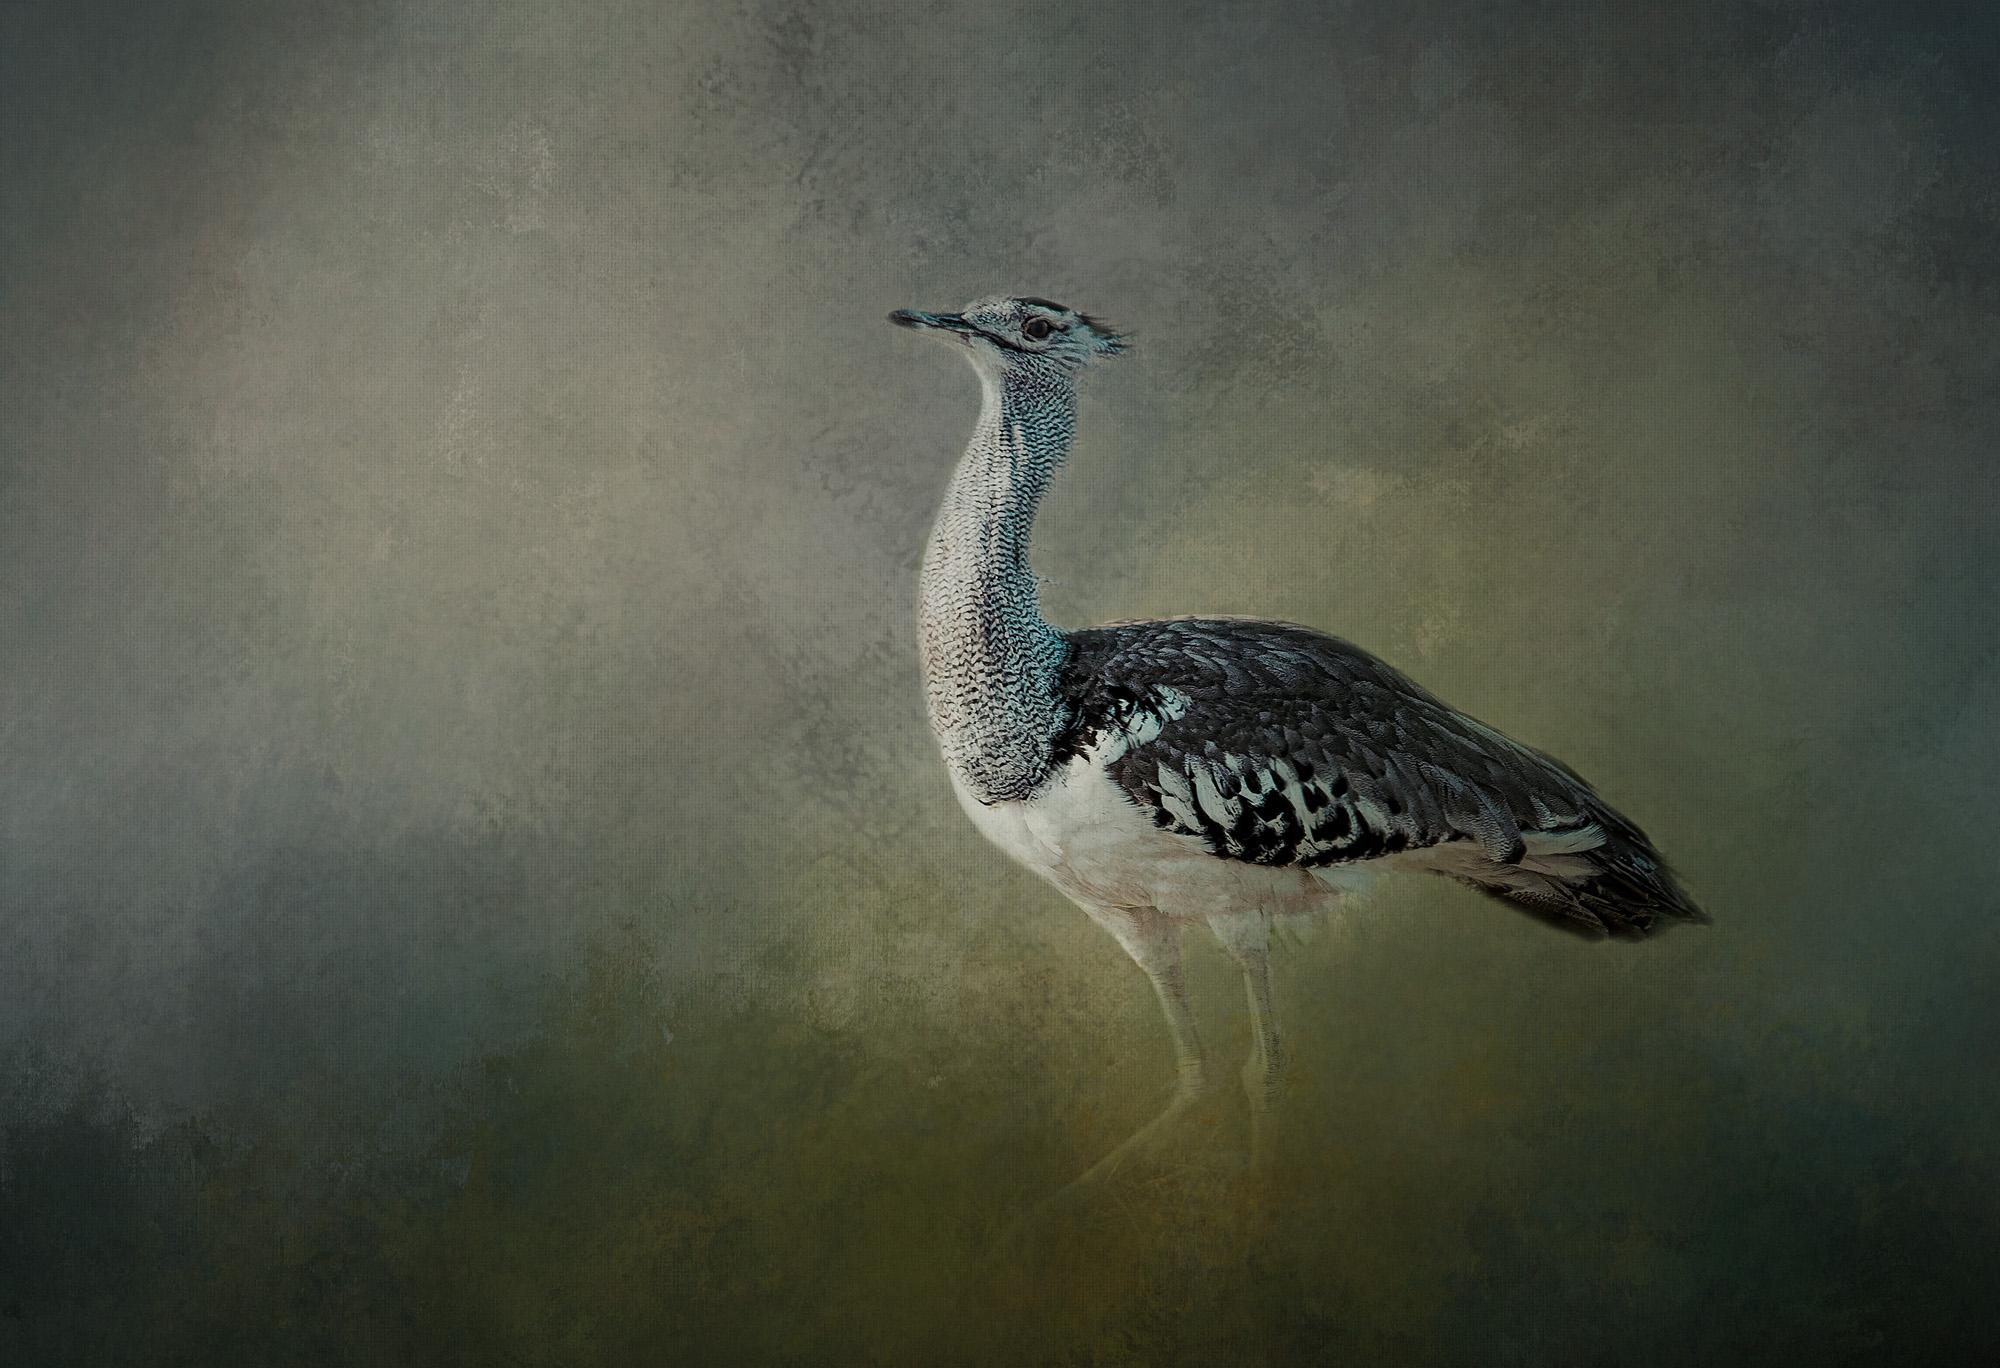 KORI BUSTARD BIRD.